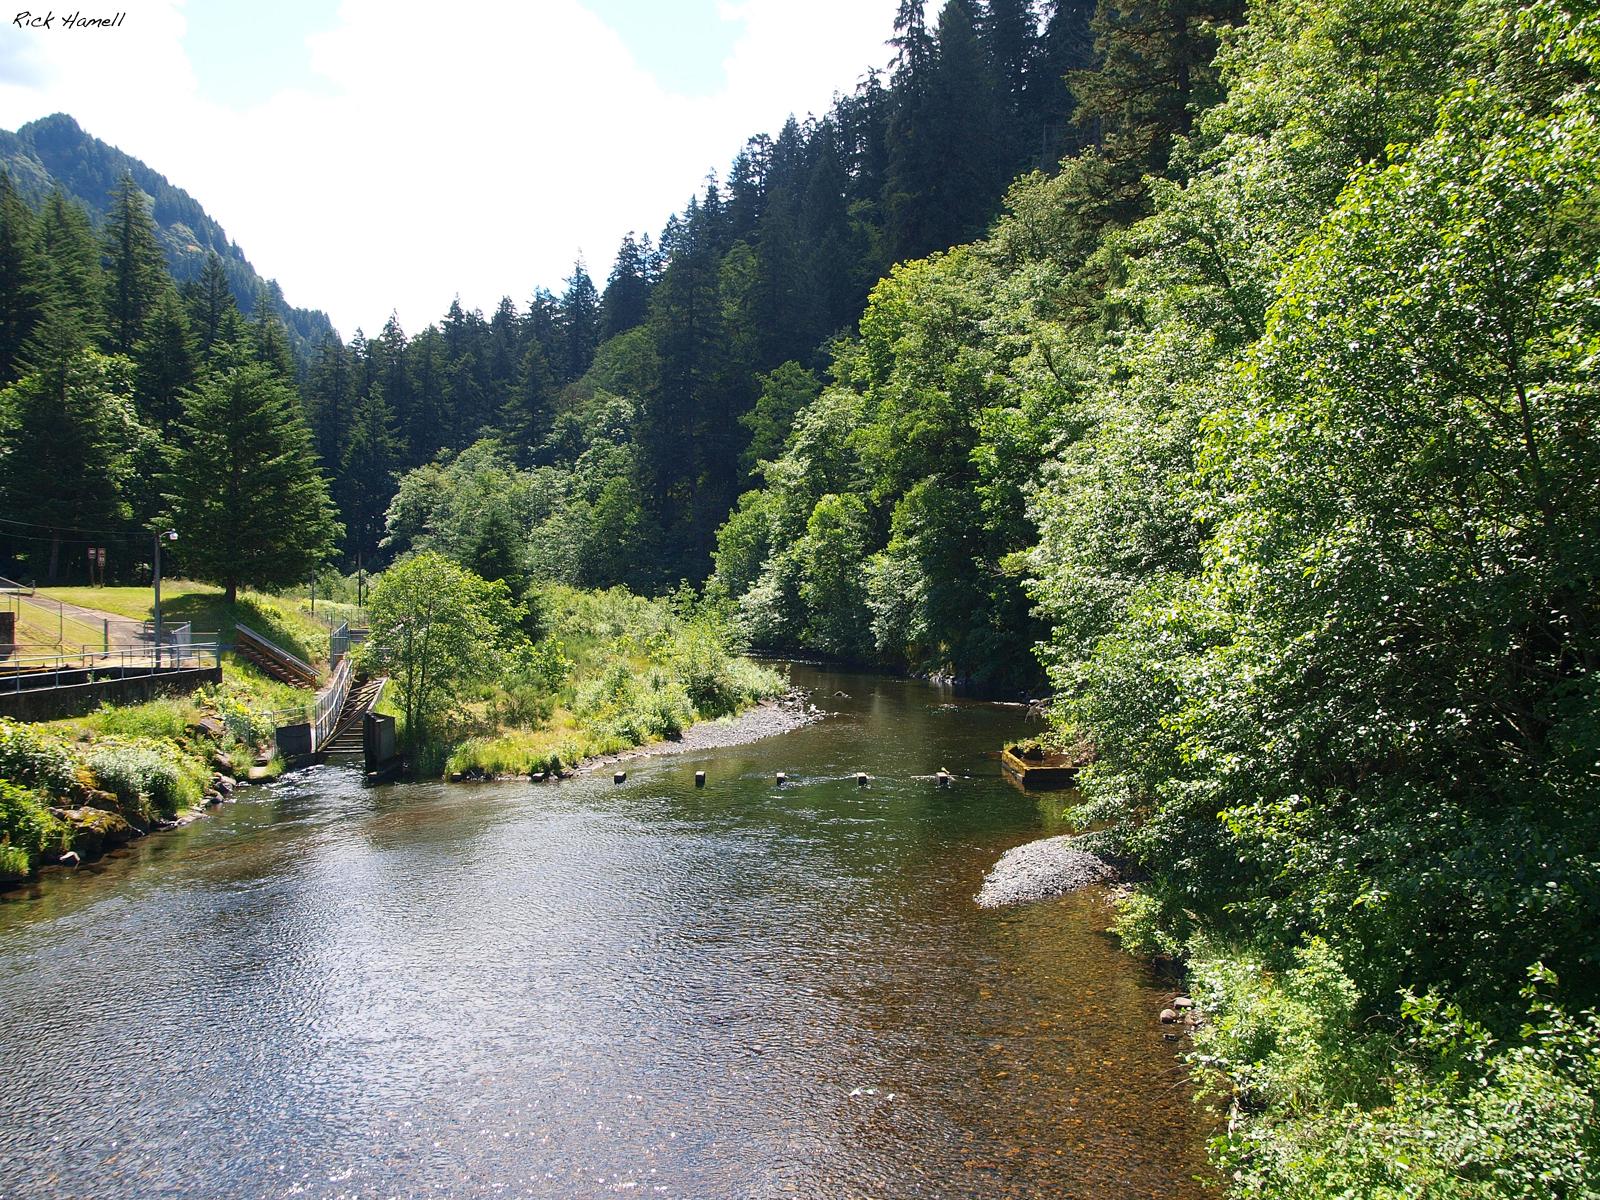 Eagle Creek Overlook Pacific Northwest Photoblog